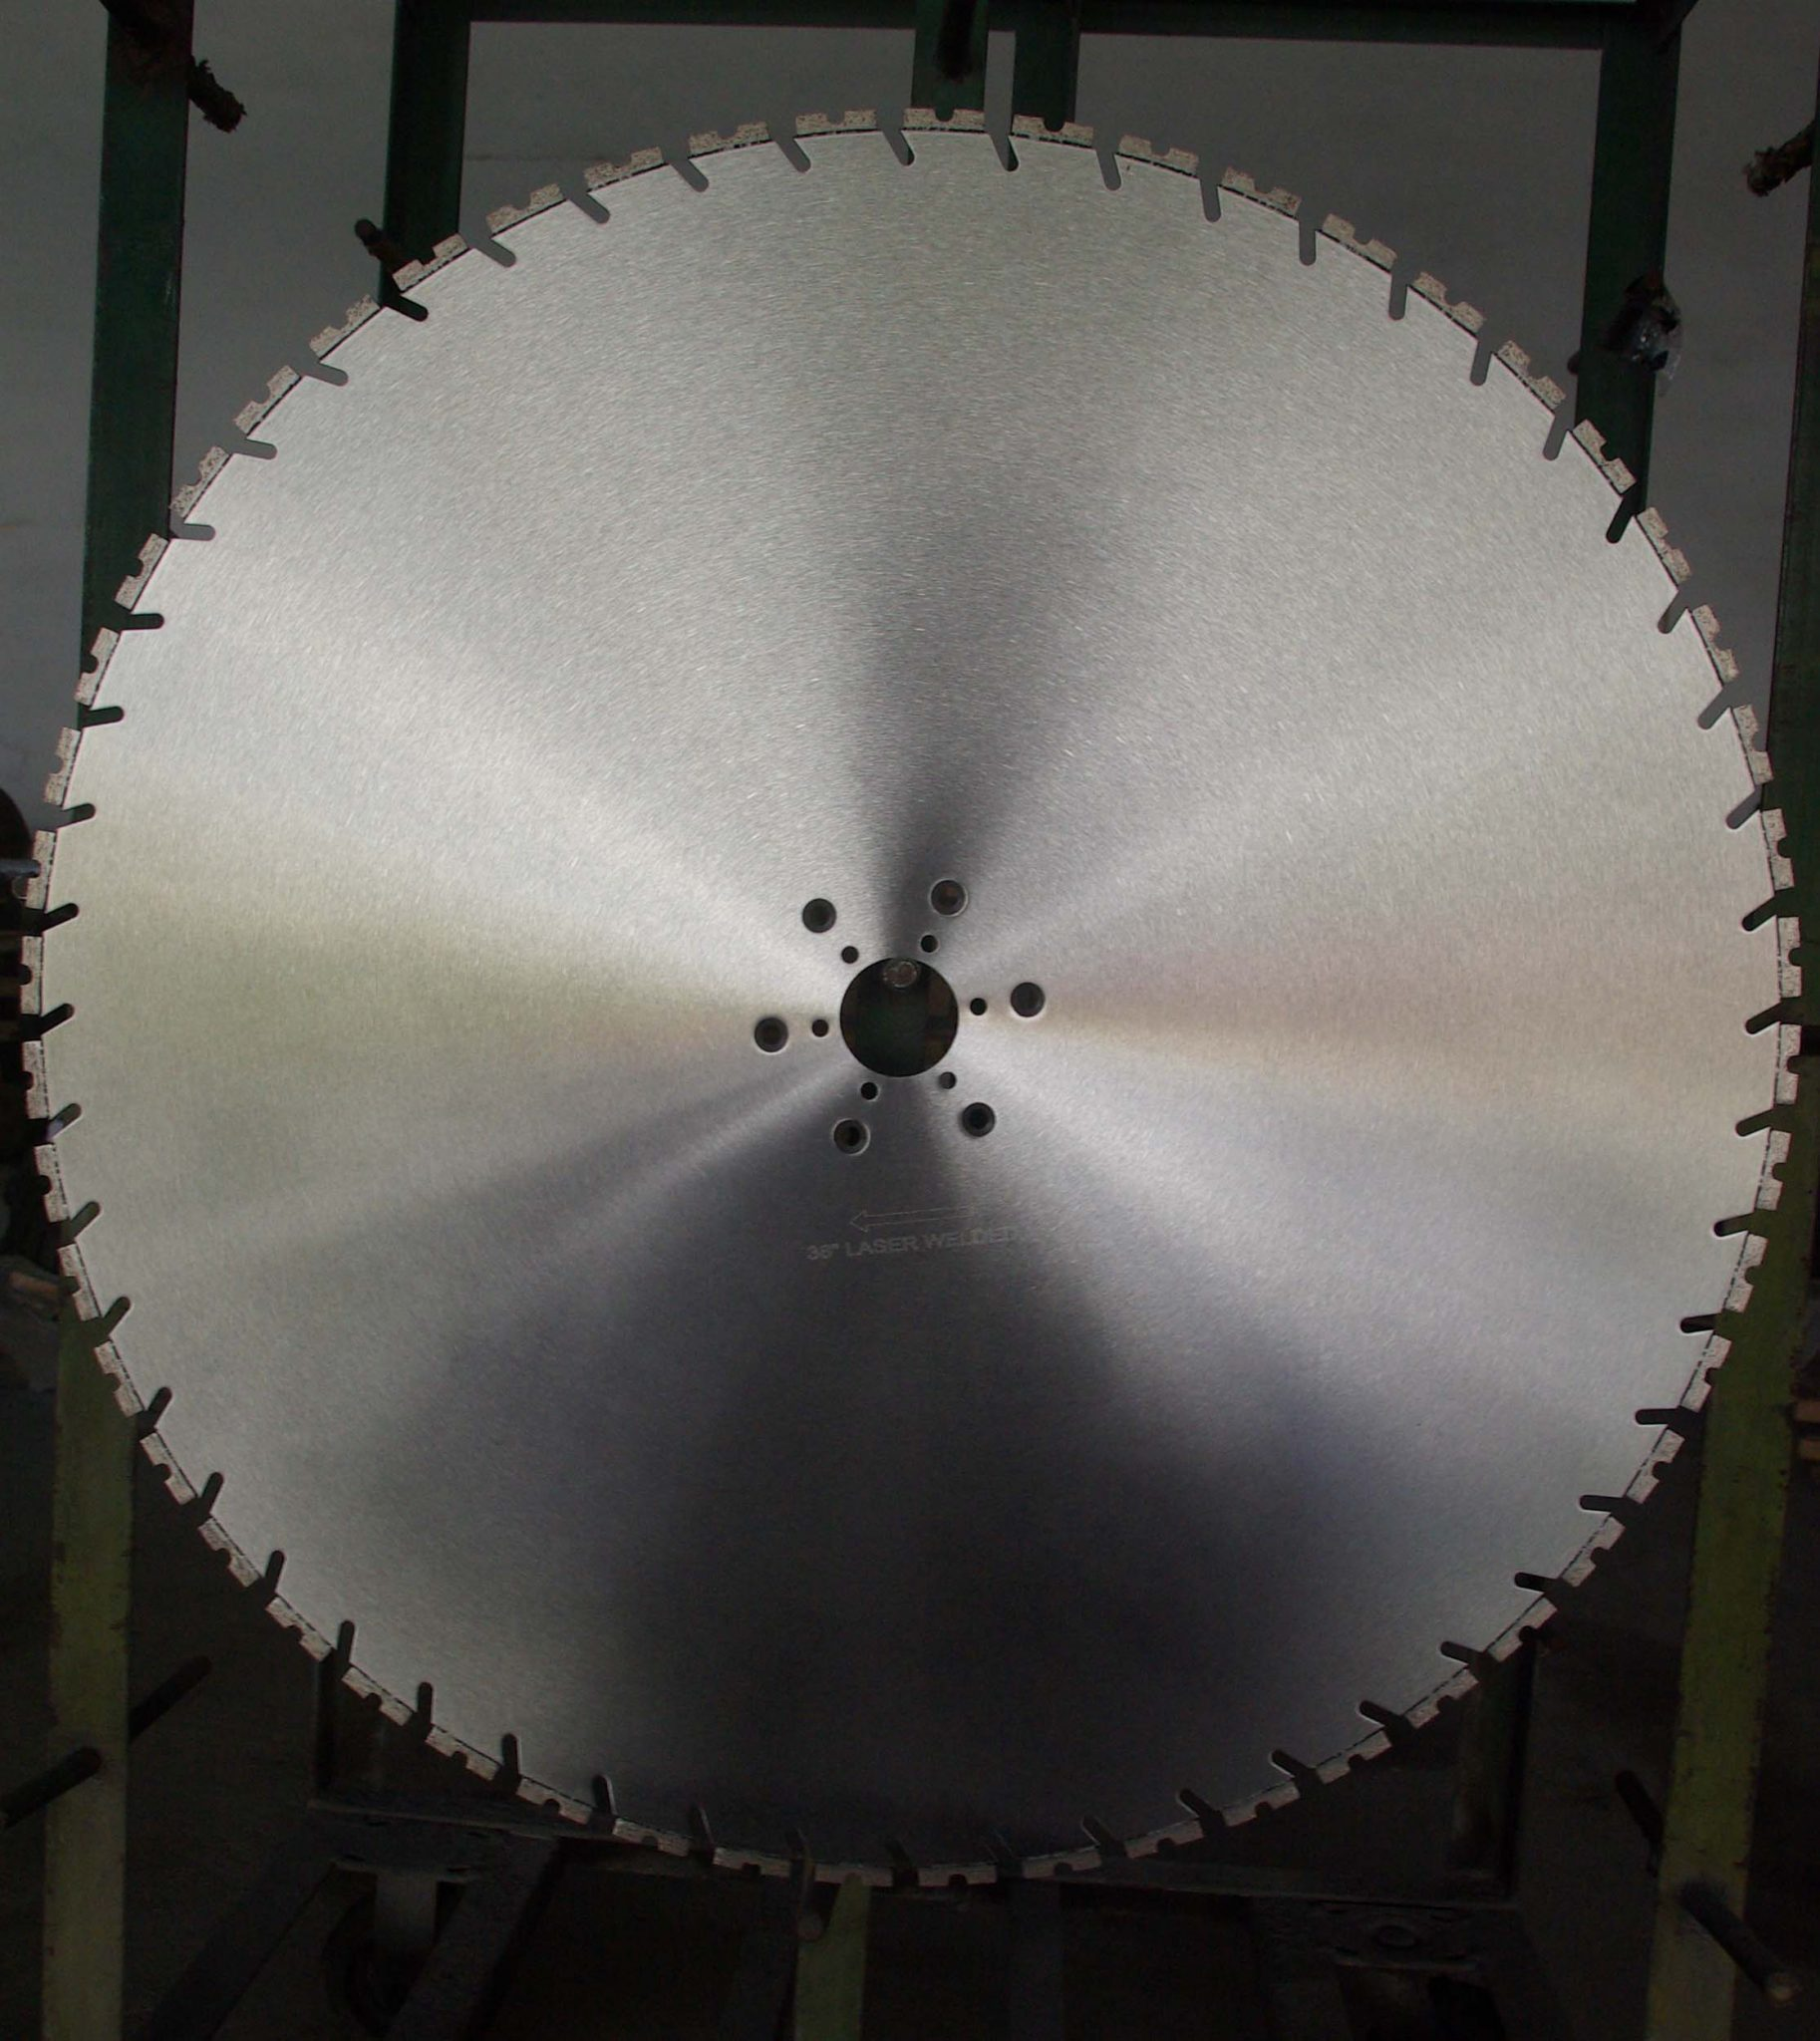 900mm wall saw blade